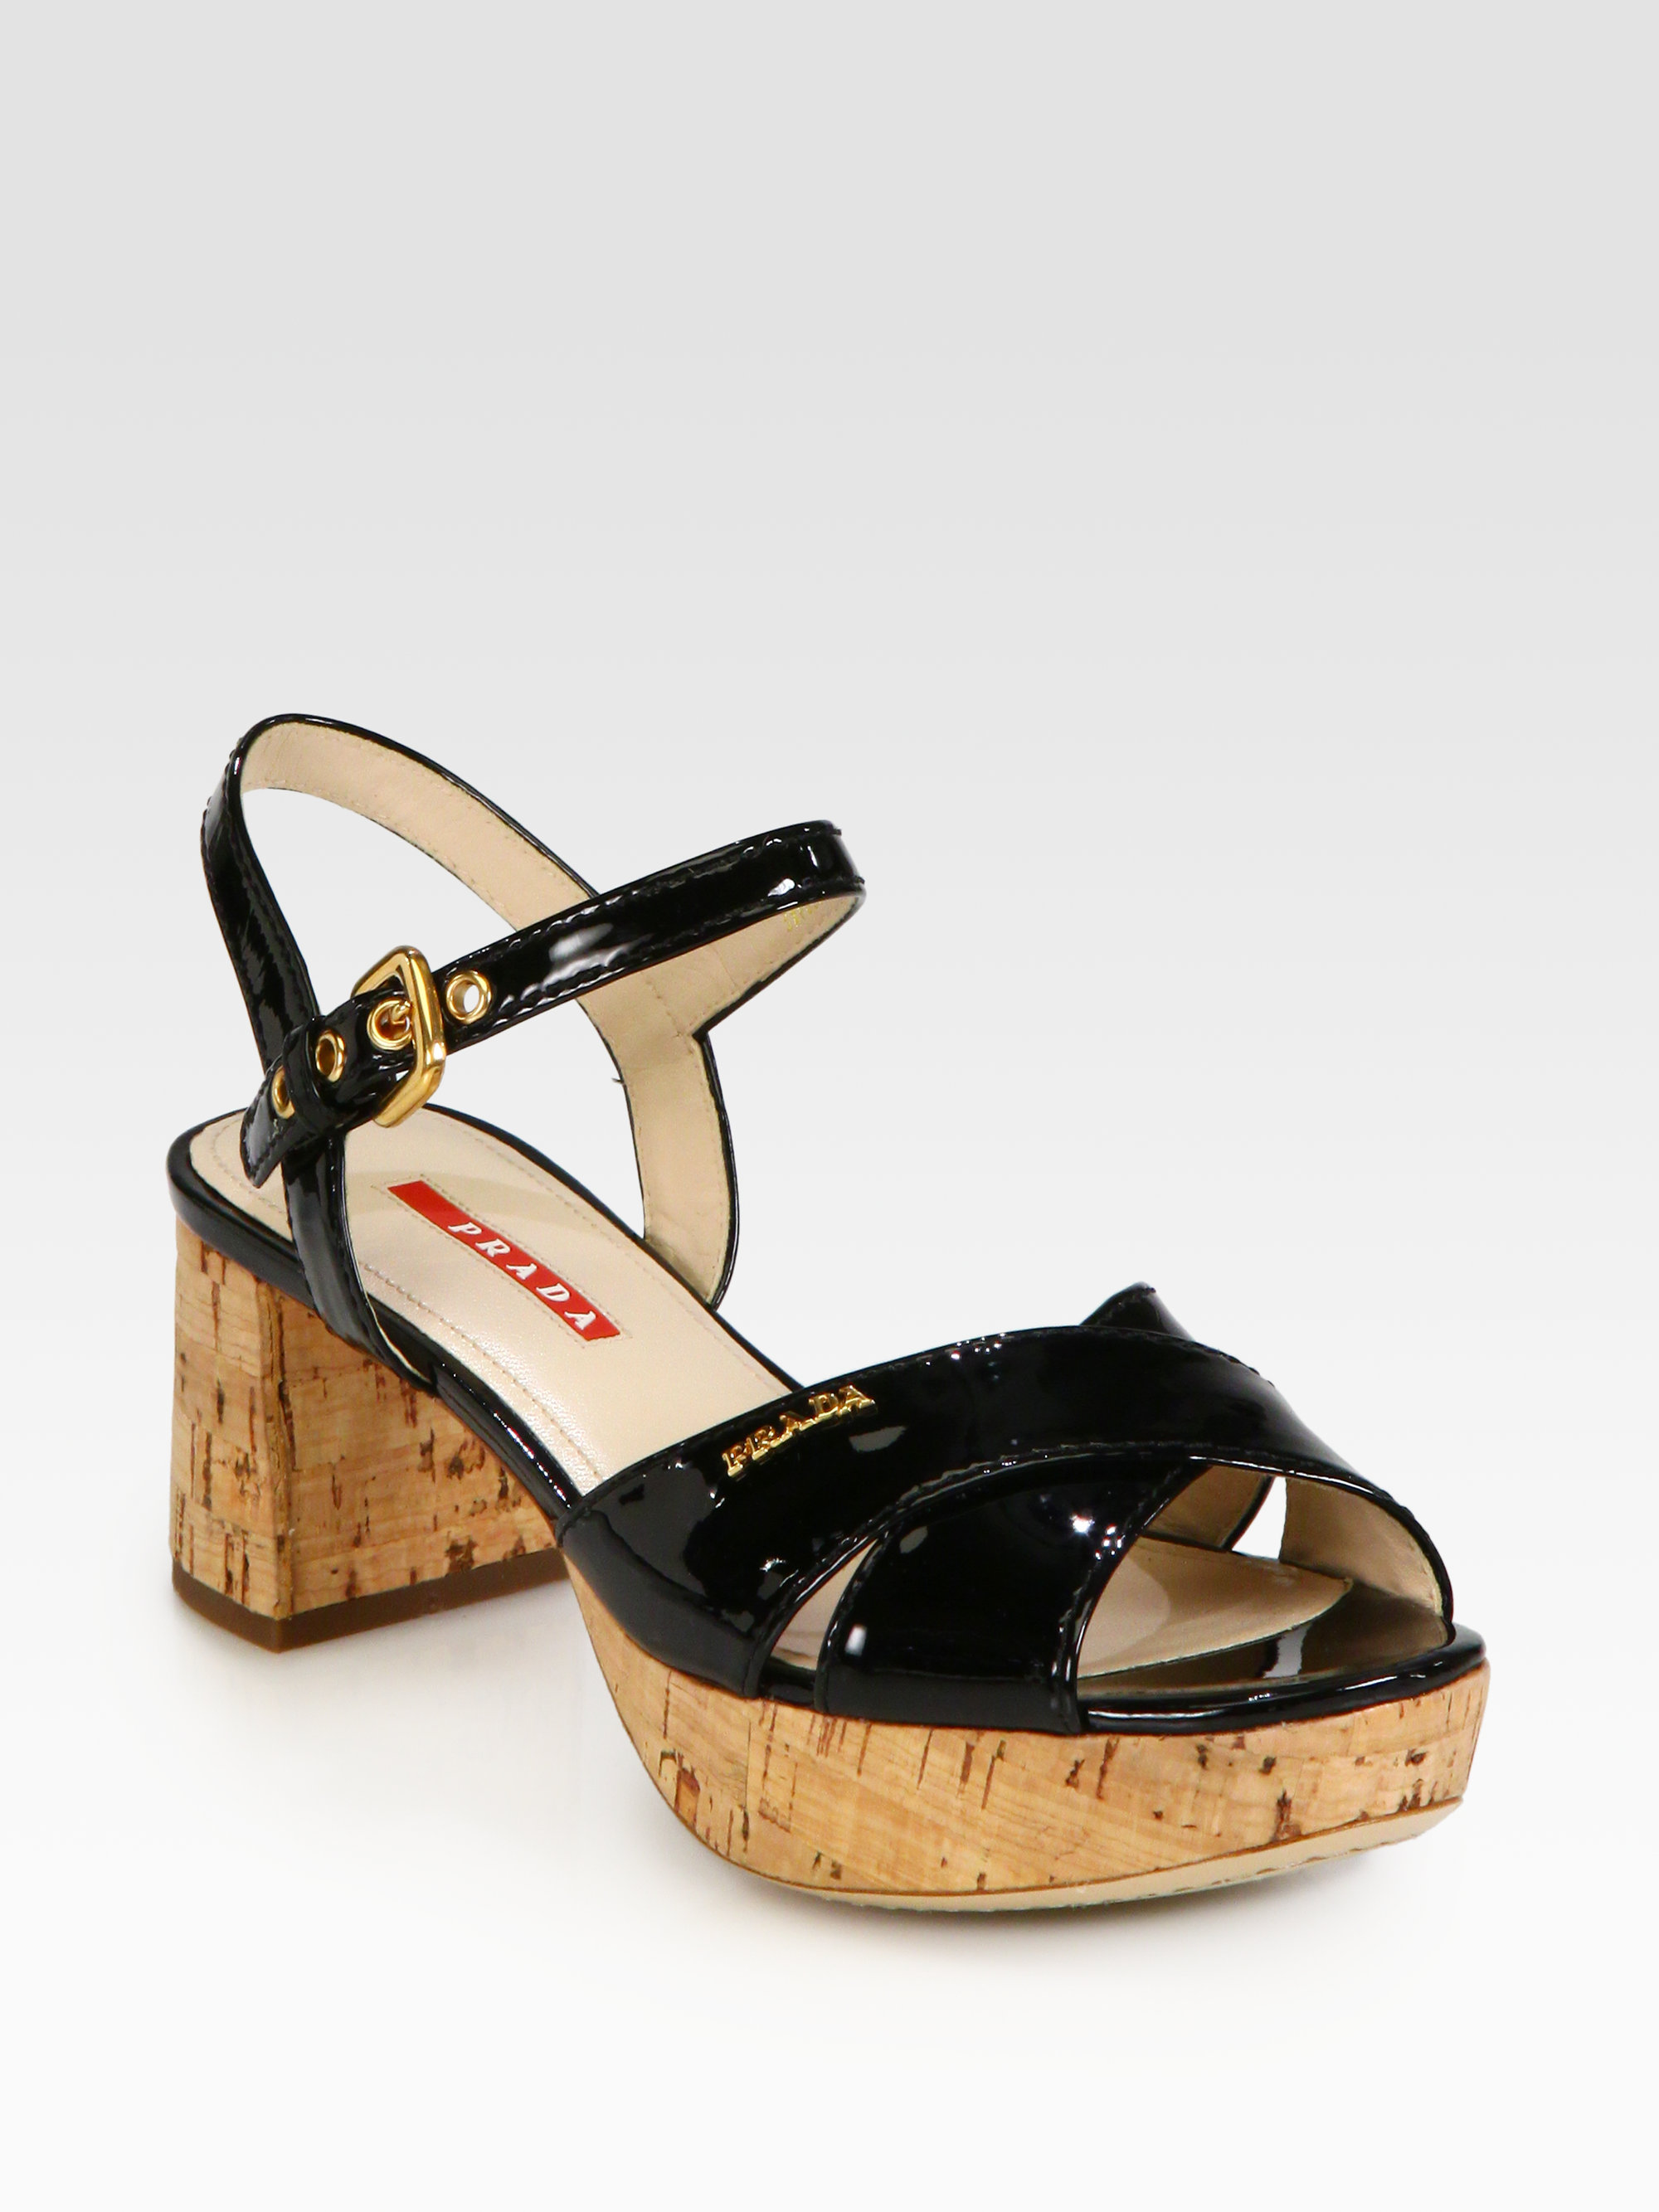 f225927d2d4 Prada Sandals Womens. Lyst - Prada Crisscross Patent Leather ...